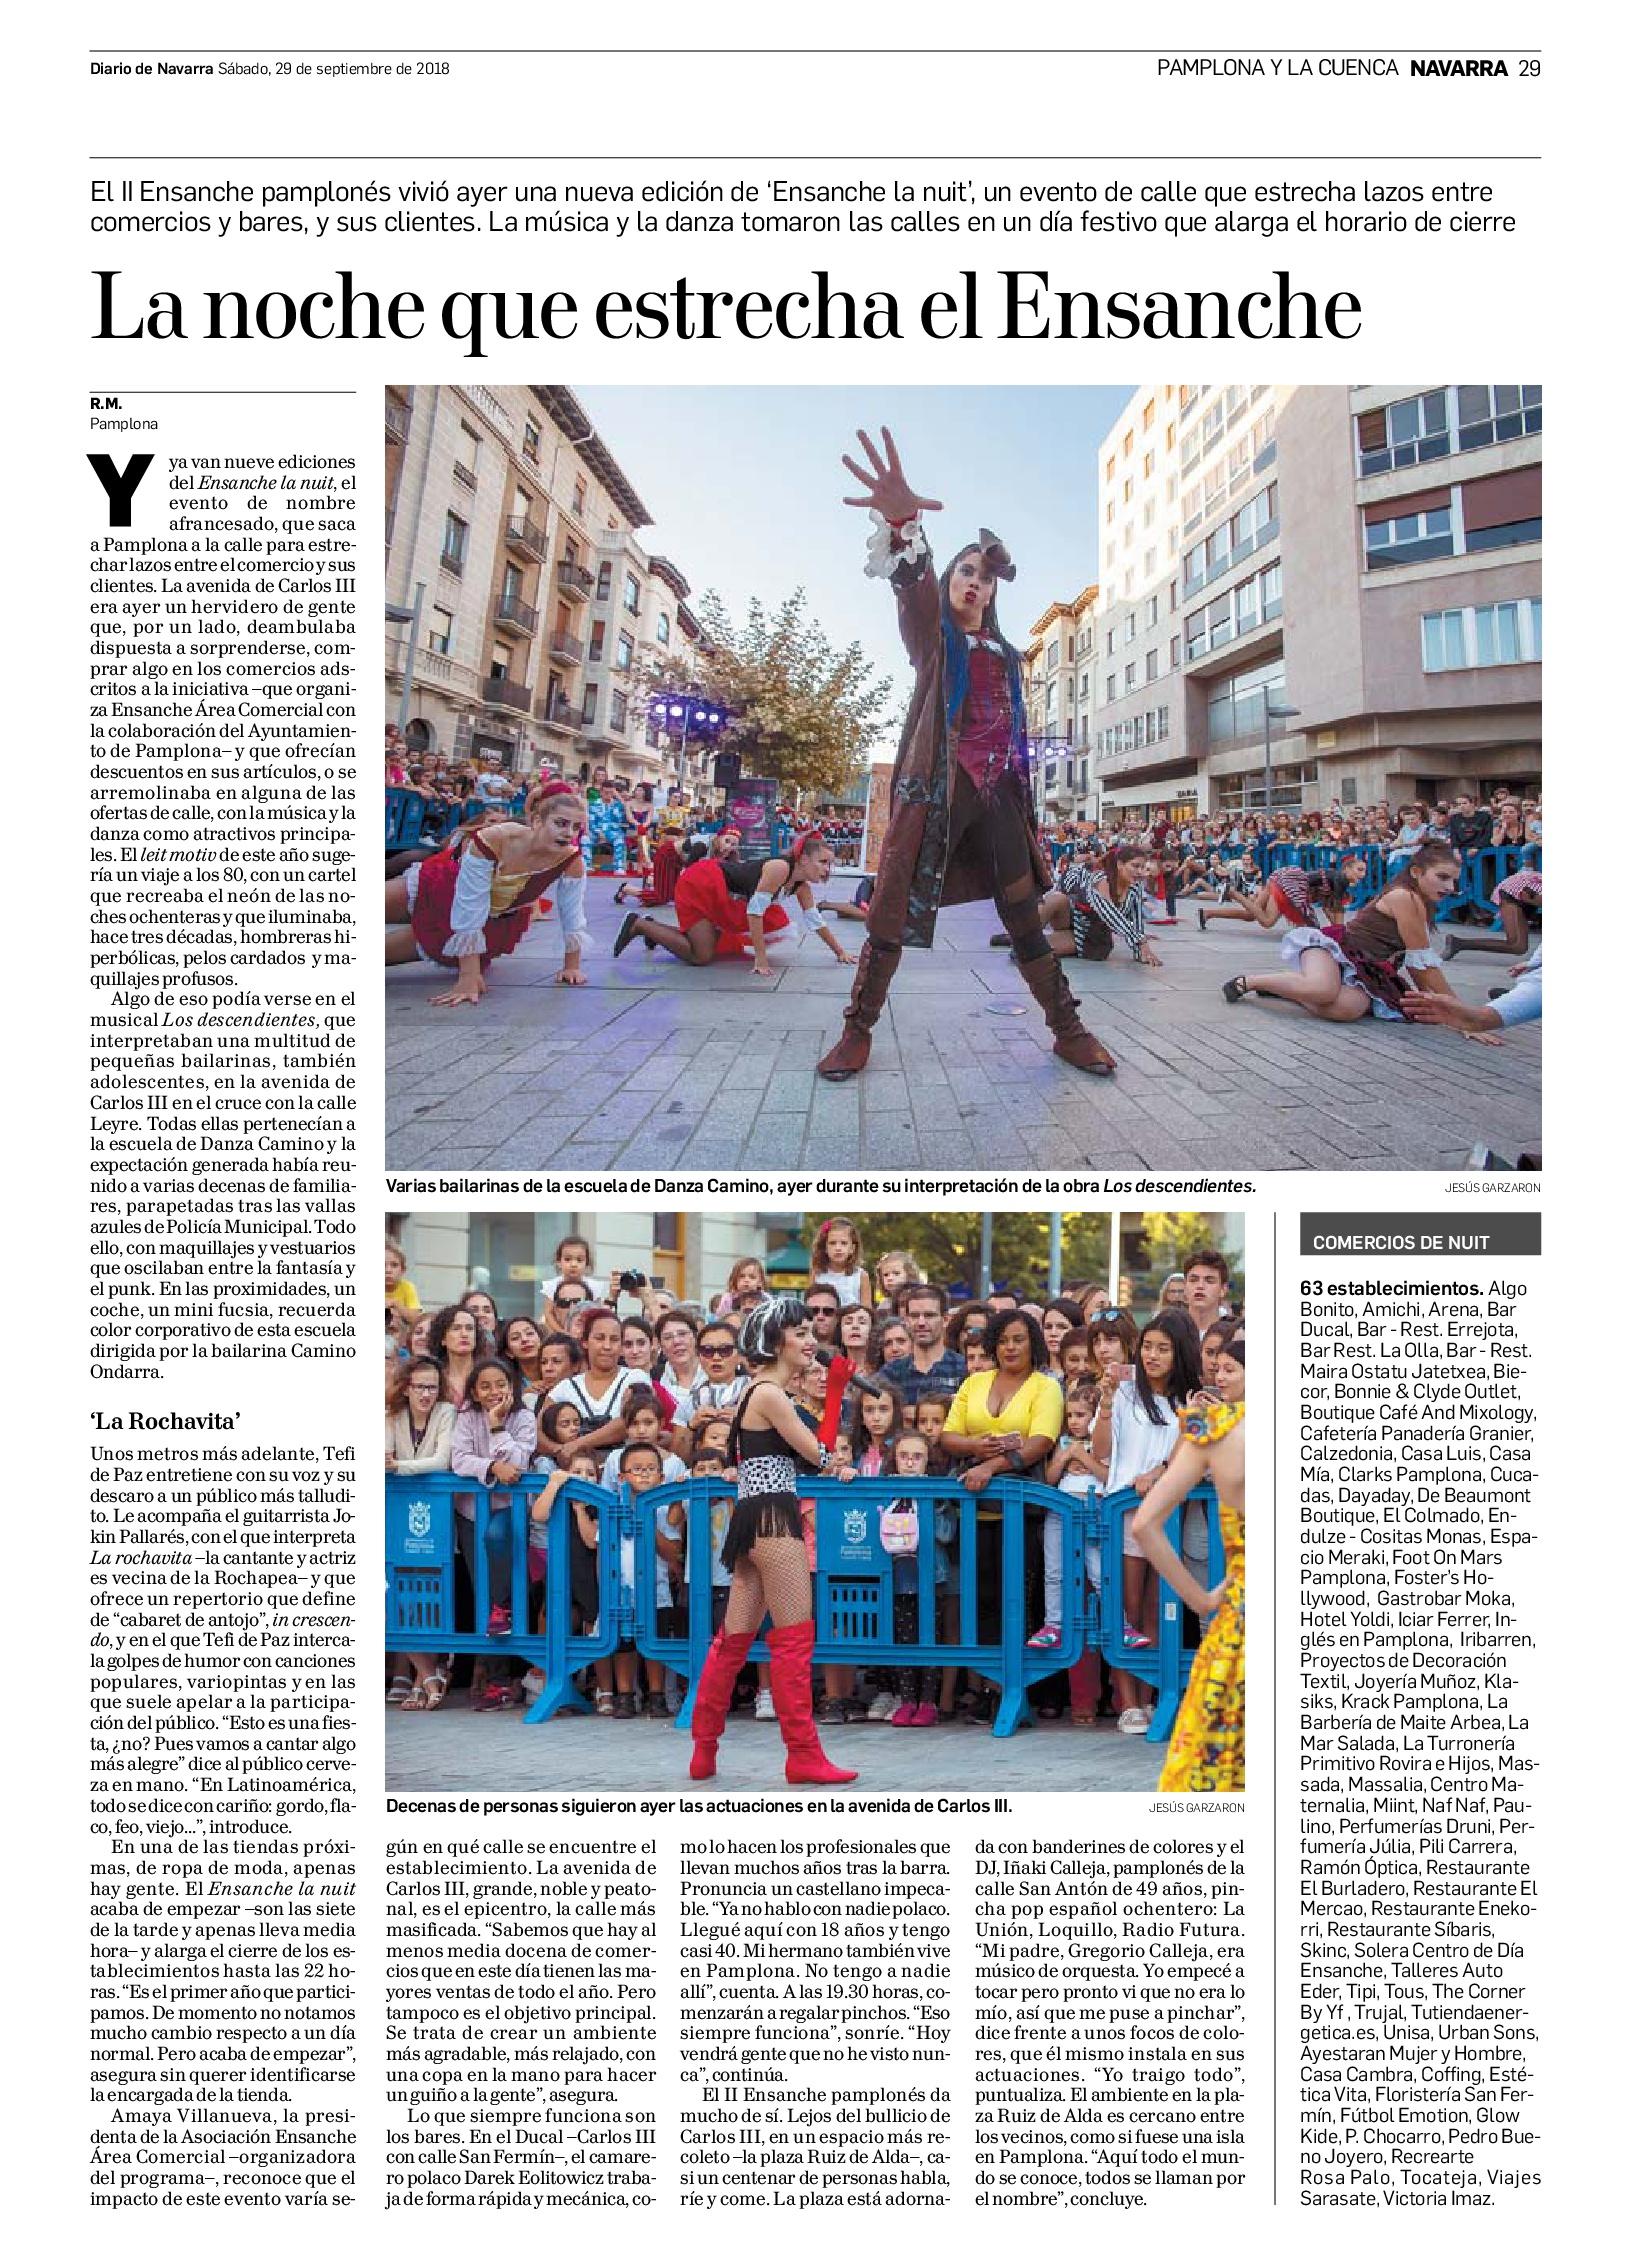 NUIT Diario Navarra PAG. 29-001